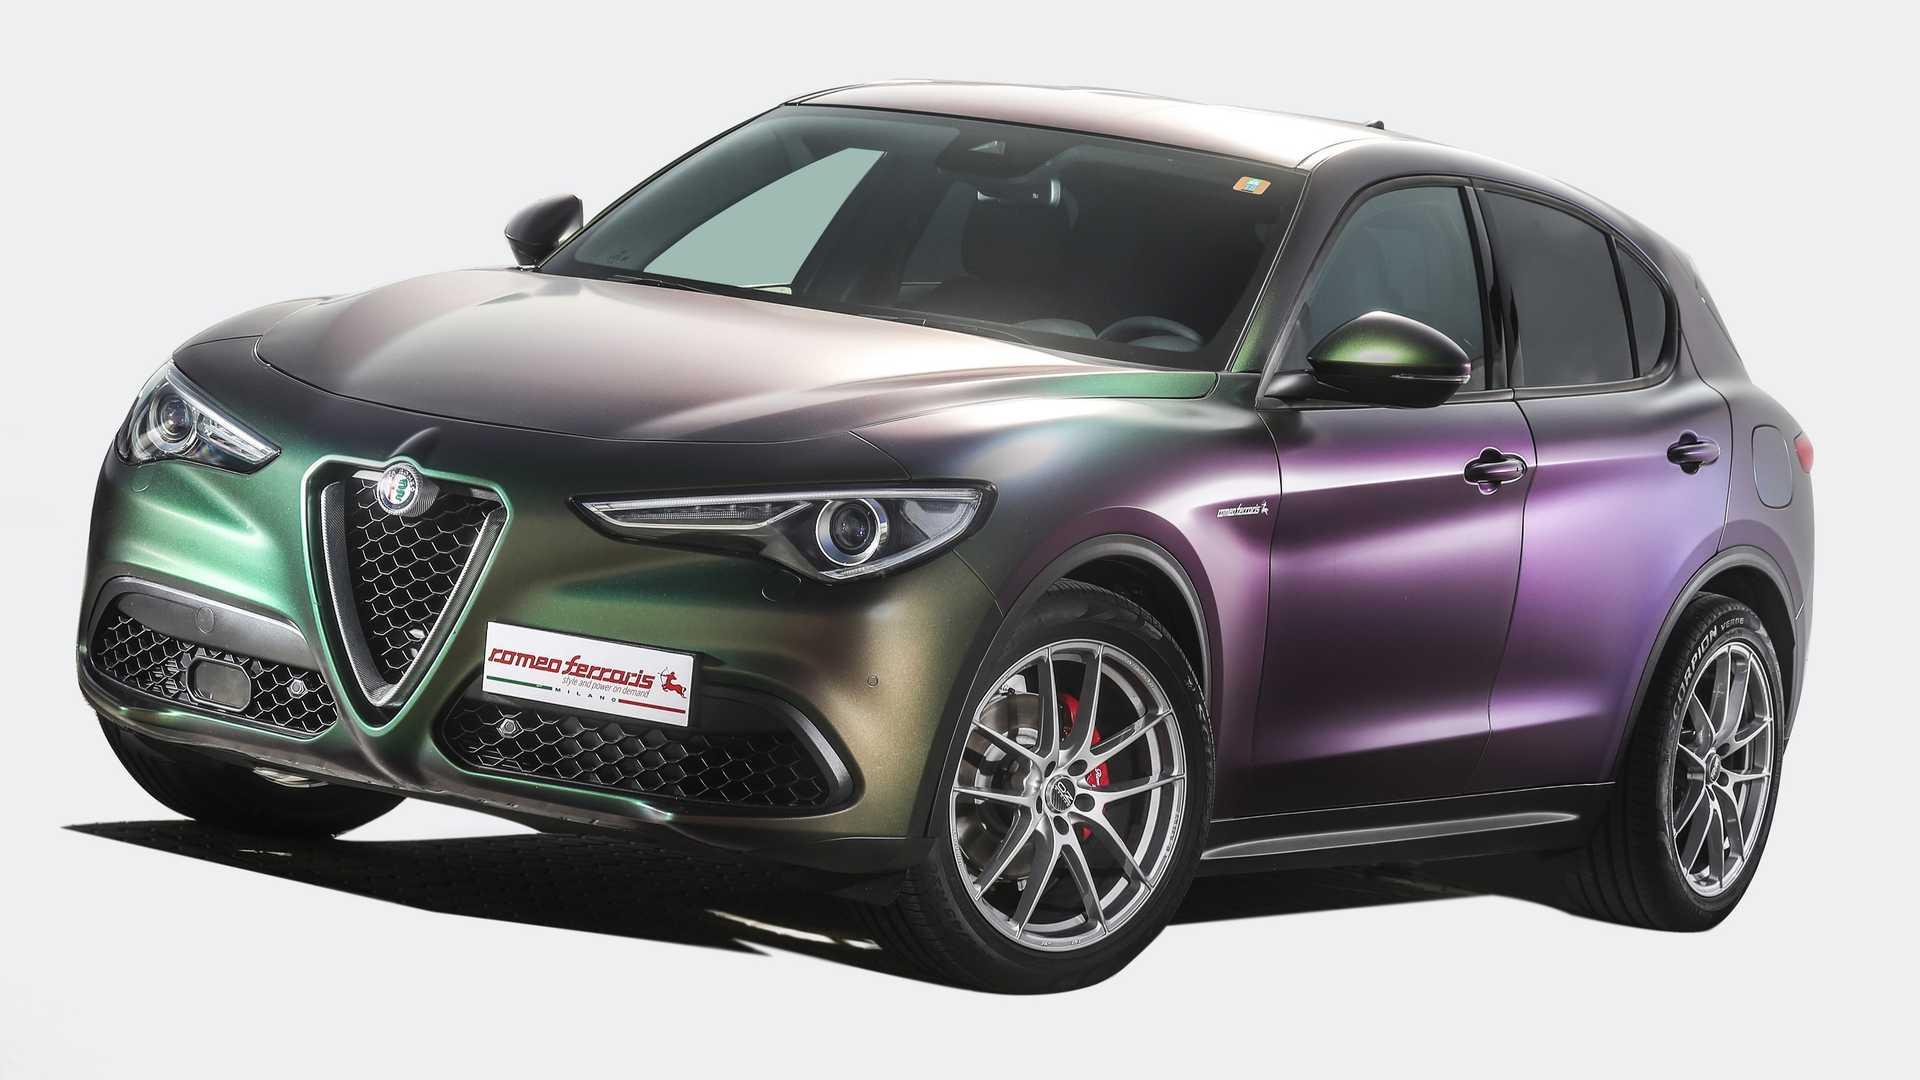 Alfa_Romeo_Stelvio_by_Romeo_Ferraris_0005